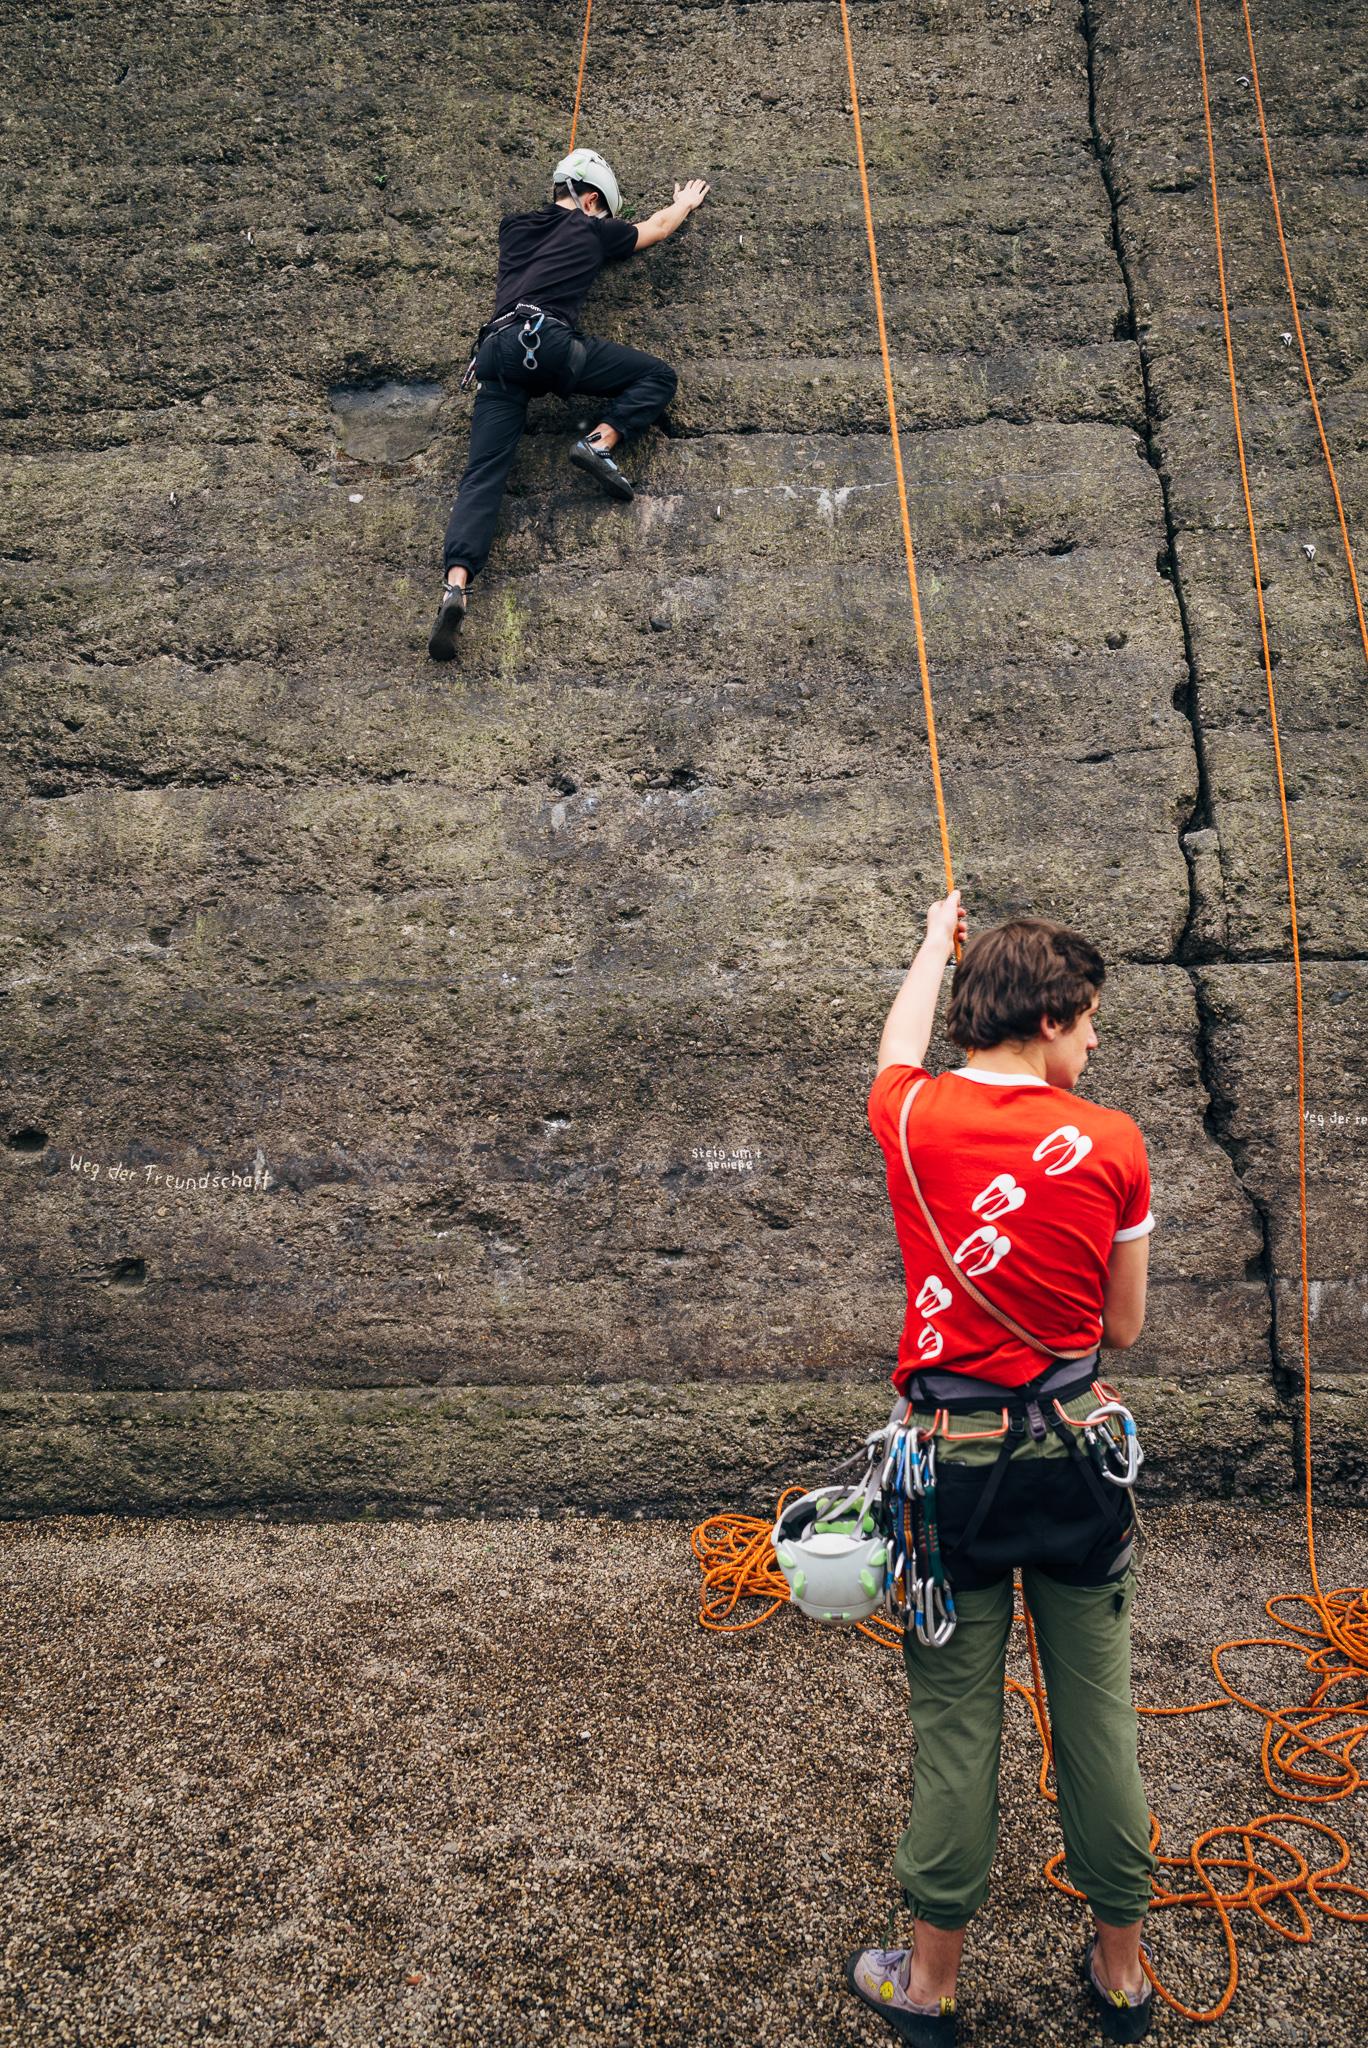 germany_duisburg_boys_climbing_typ240_28mm_elmarit_asph_3